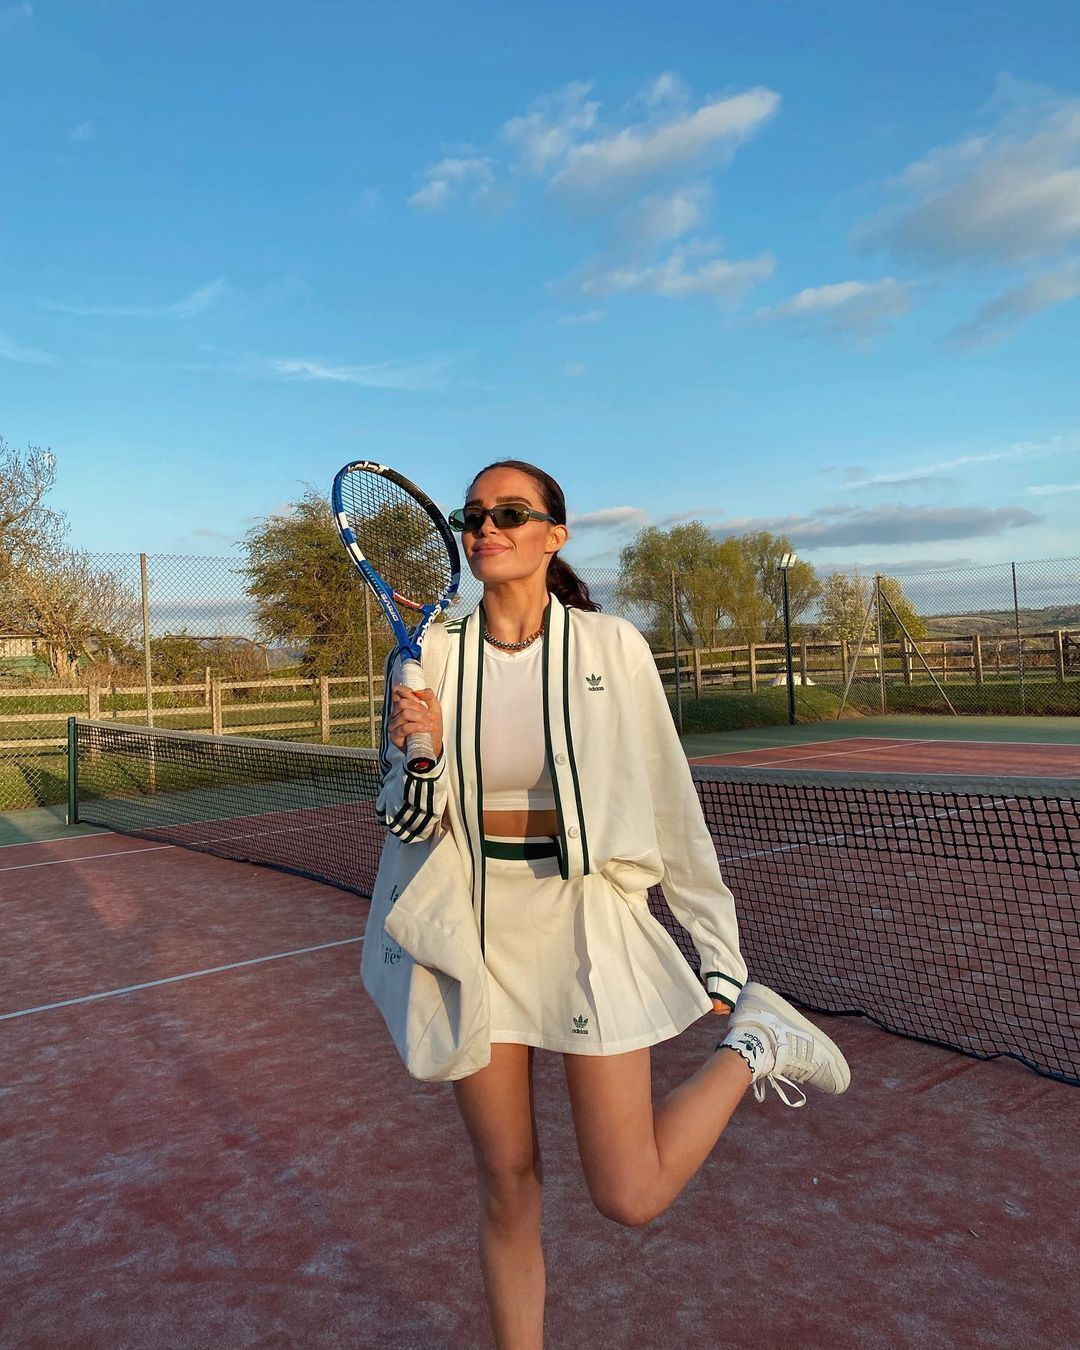 Теннисная юбка – хит лета 2021